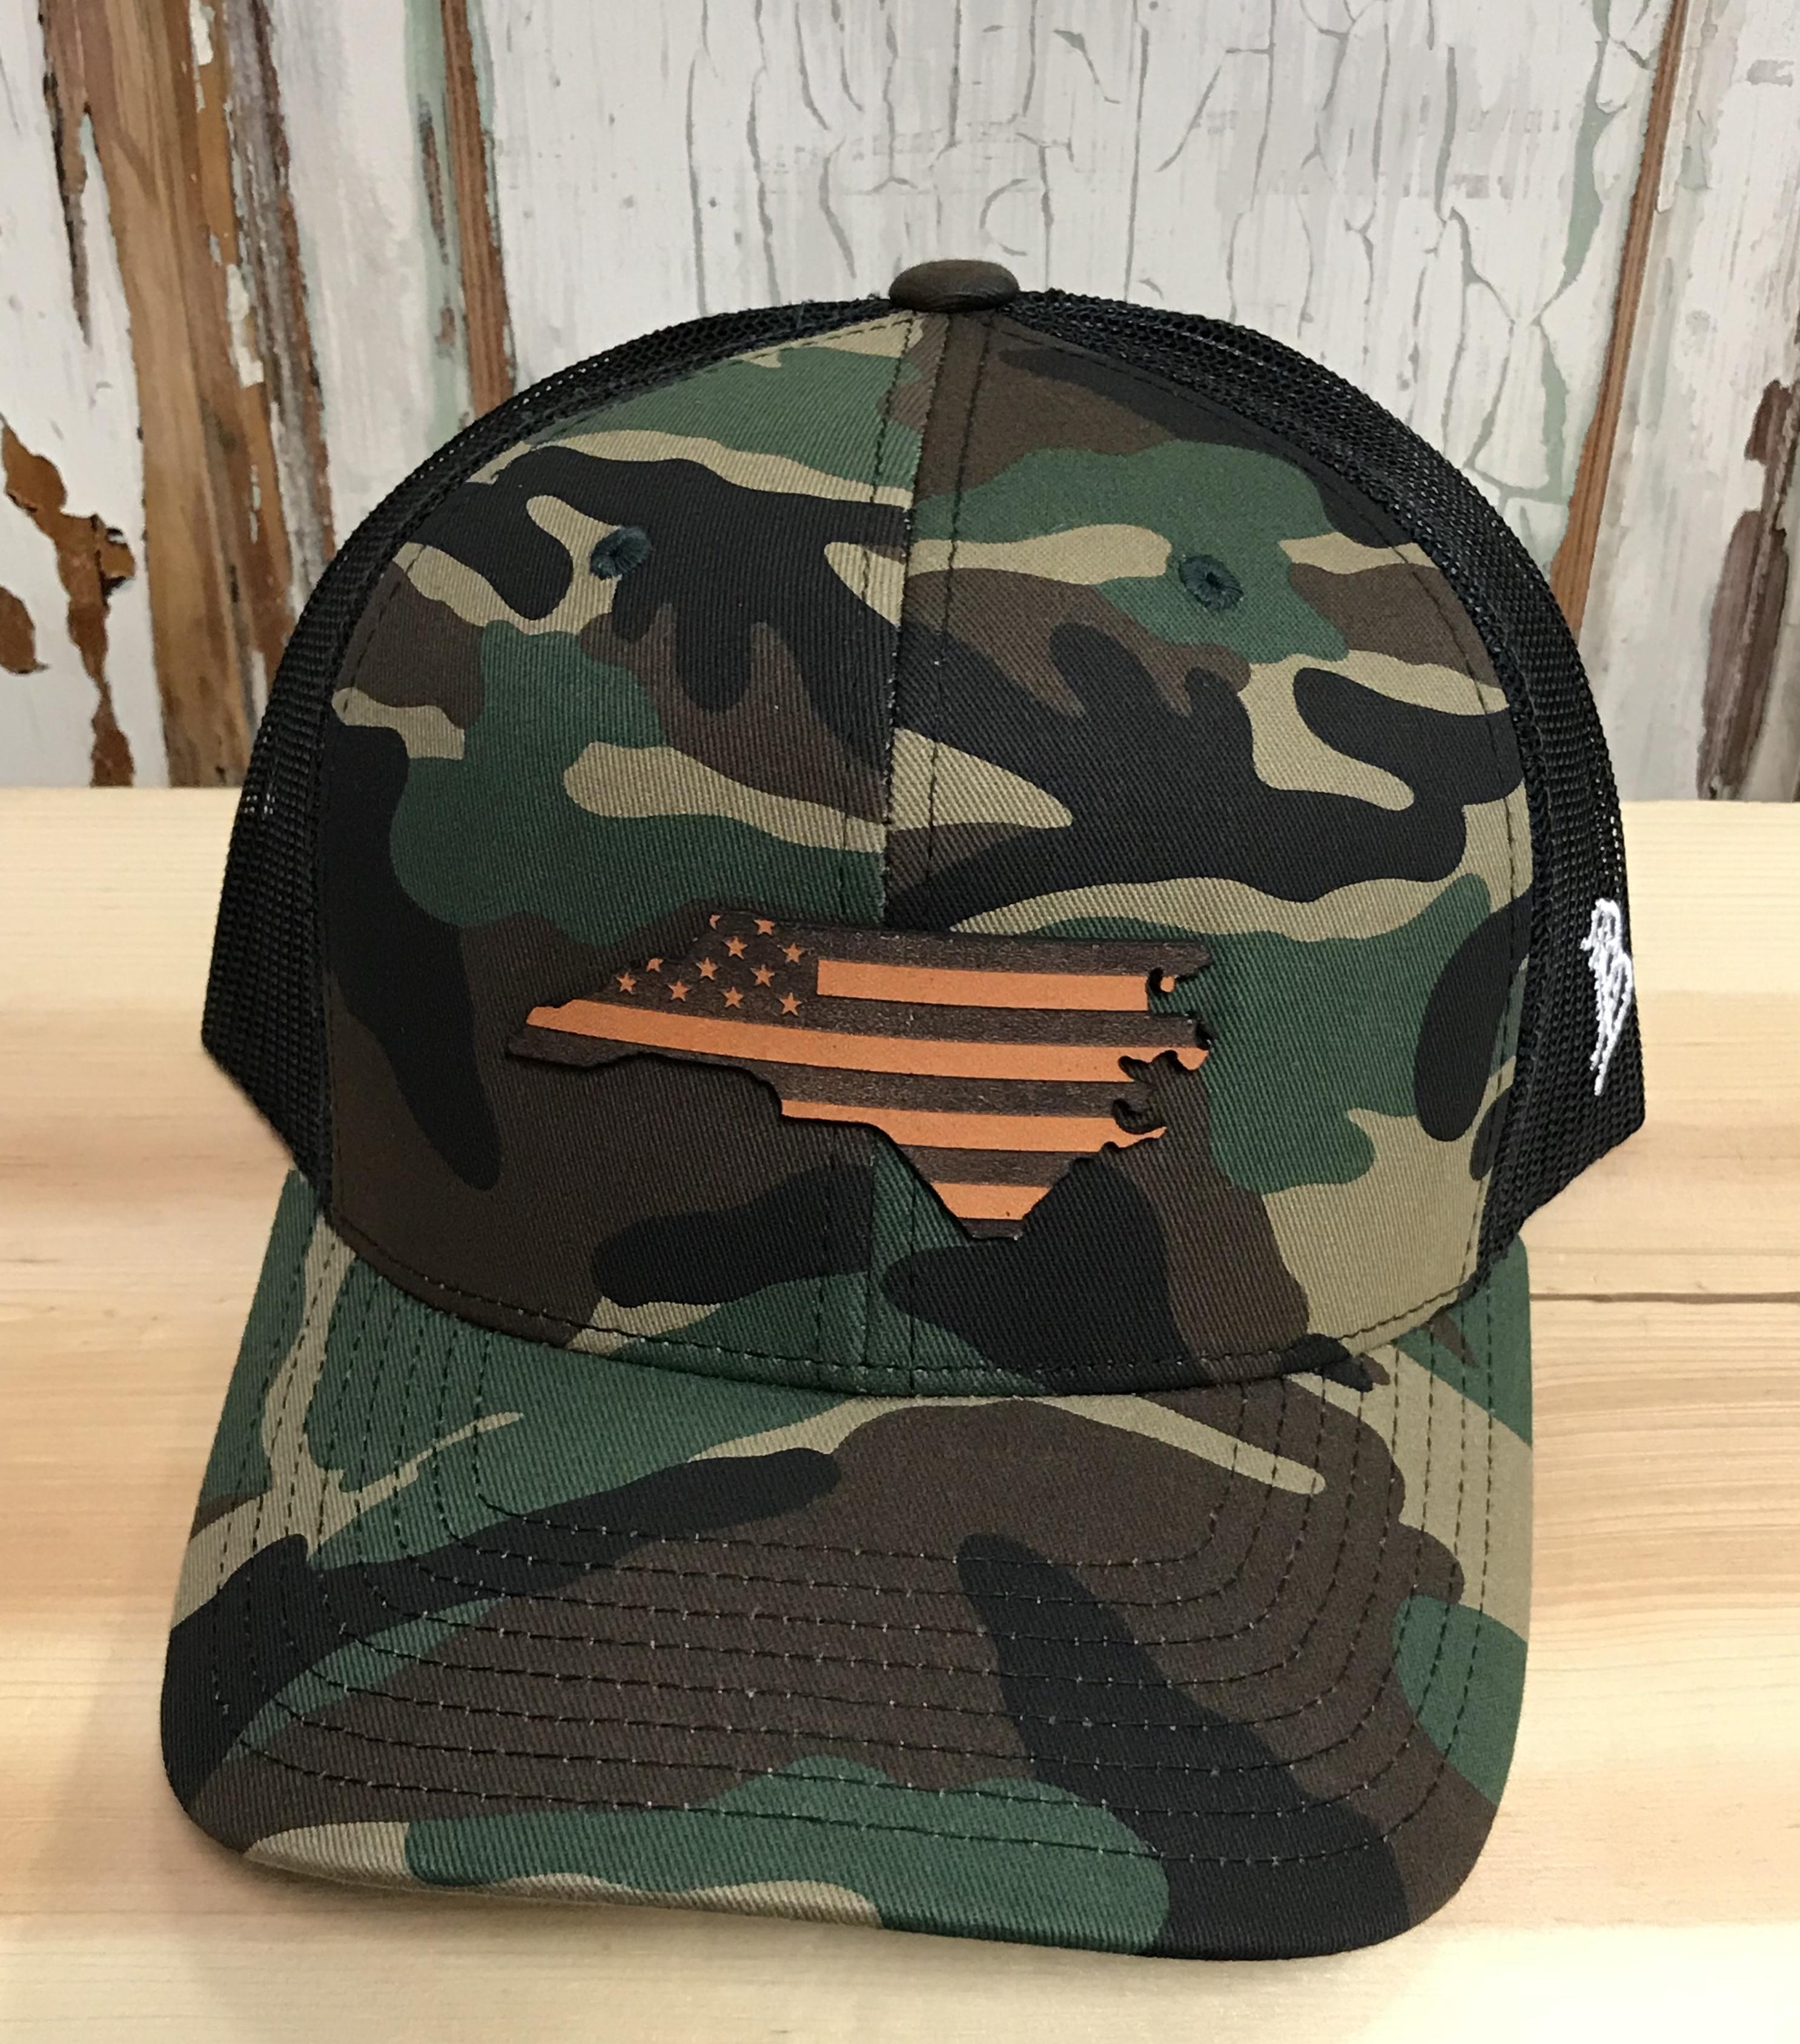 a5cc8715c Branded Bills North Carolina Patriot Leather Patch Snapback Trucker Hat  Camo/Black